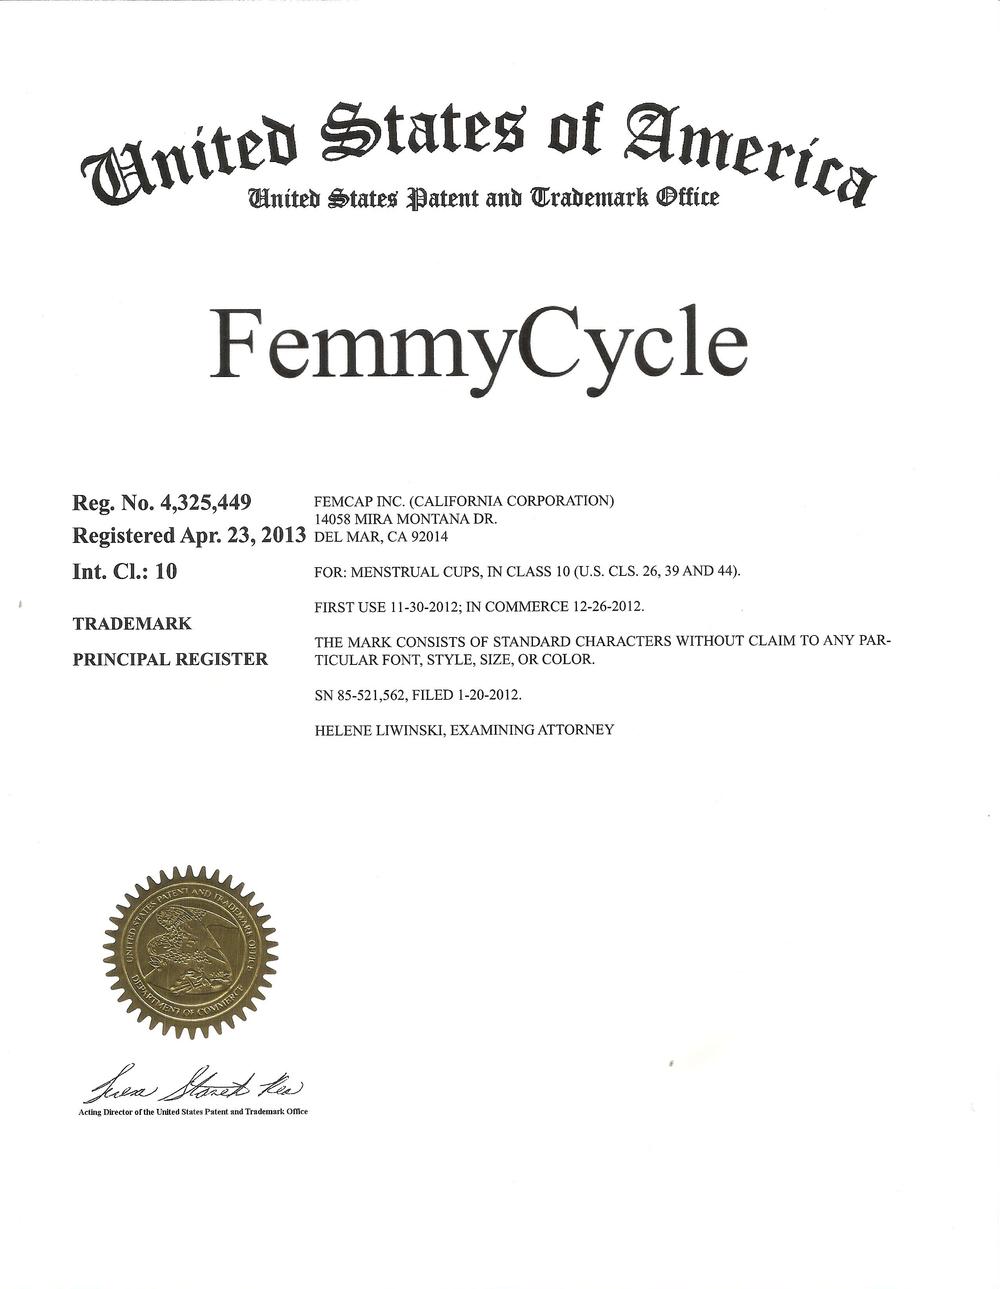 Патент ФемміЦикл ® 2013, США